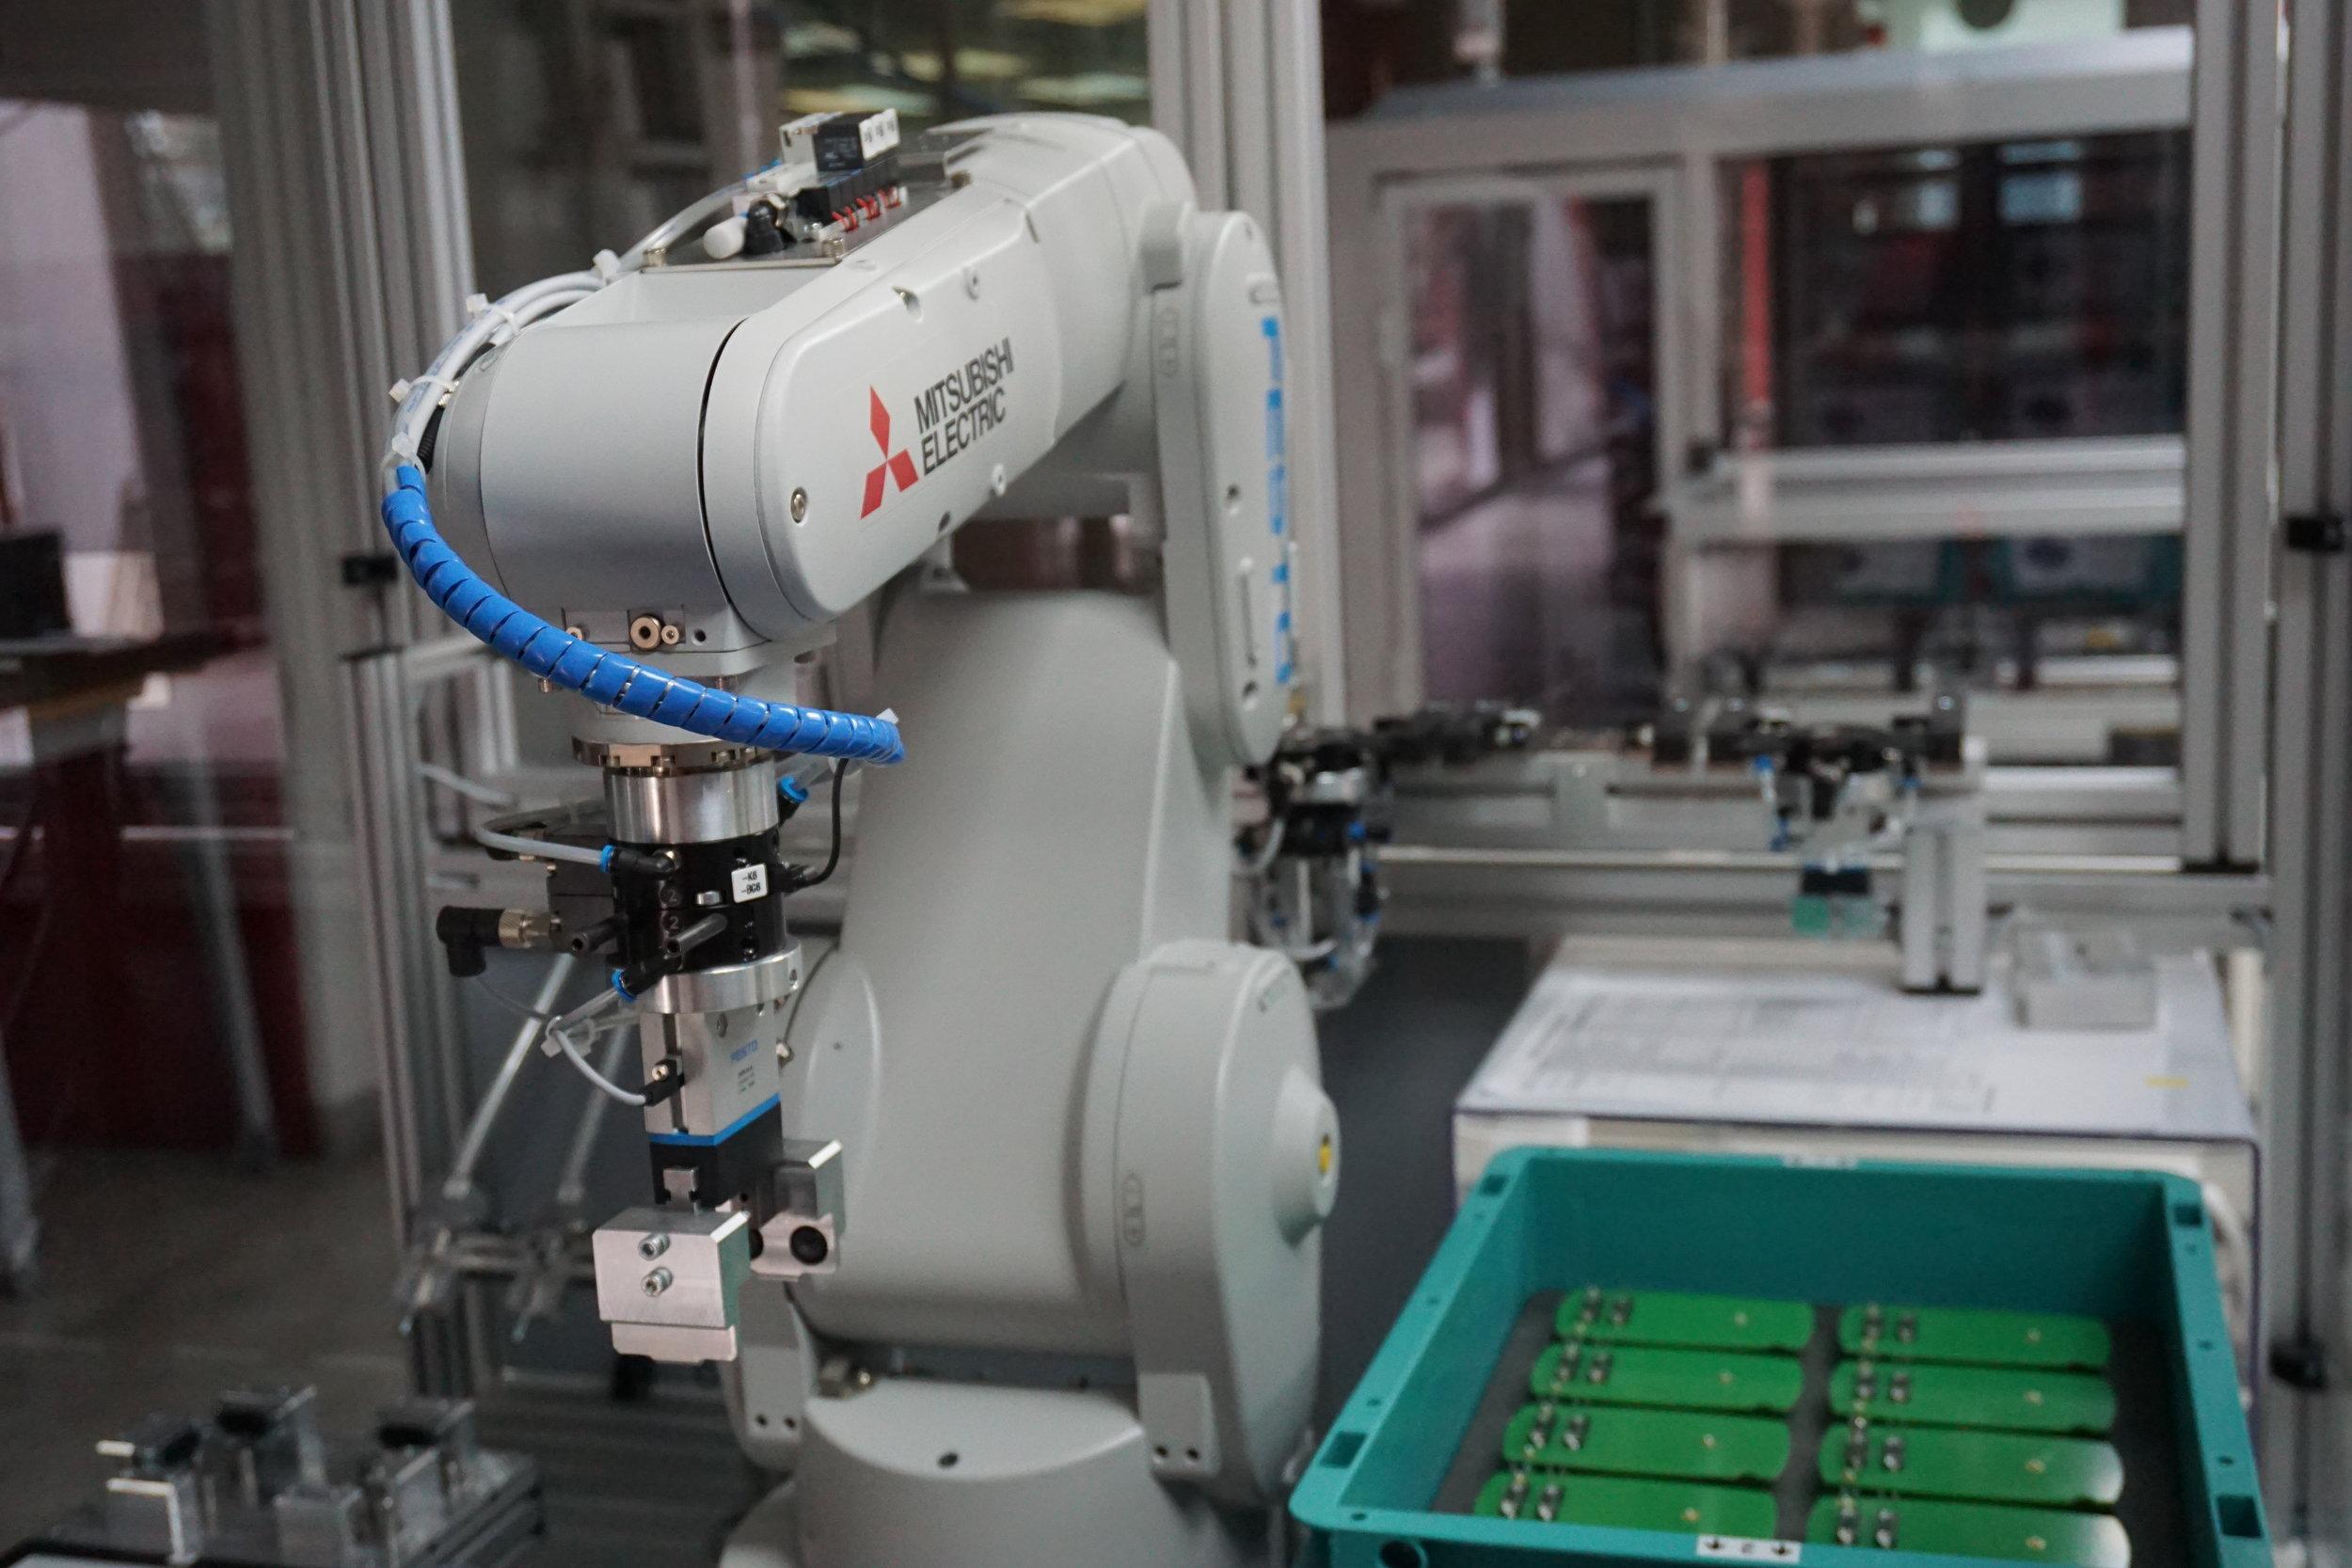 Affordable Laser-free Retrofittable Stroboscopic Solution -